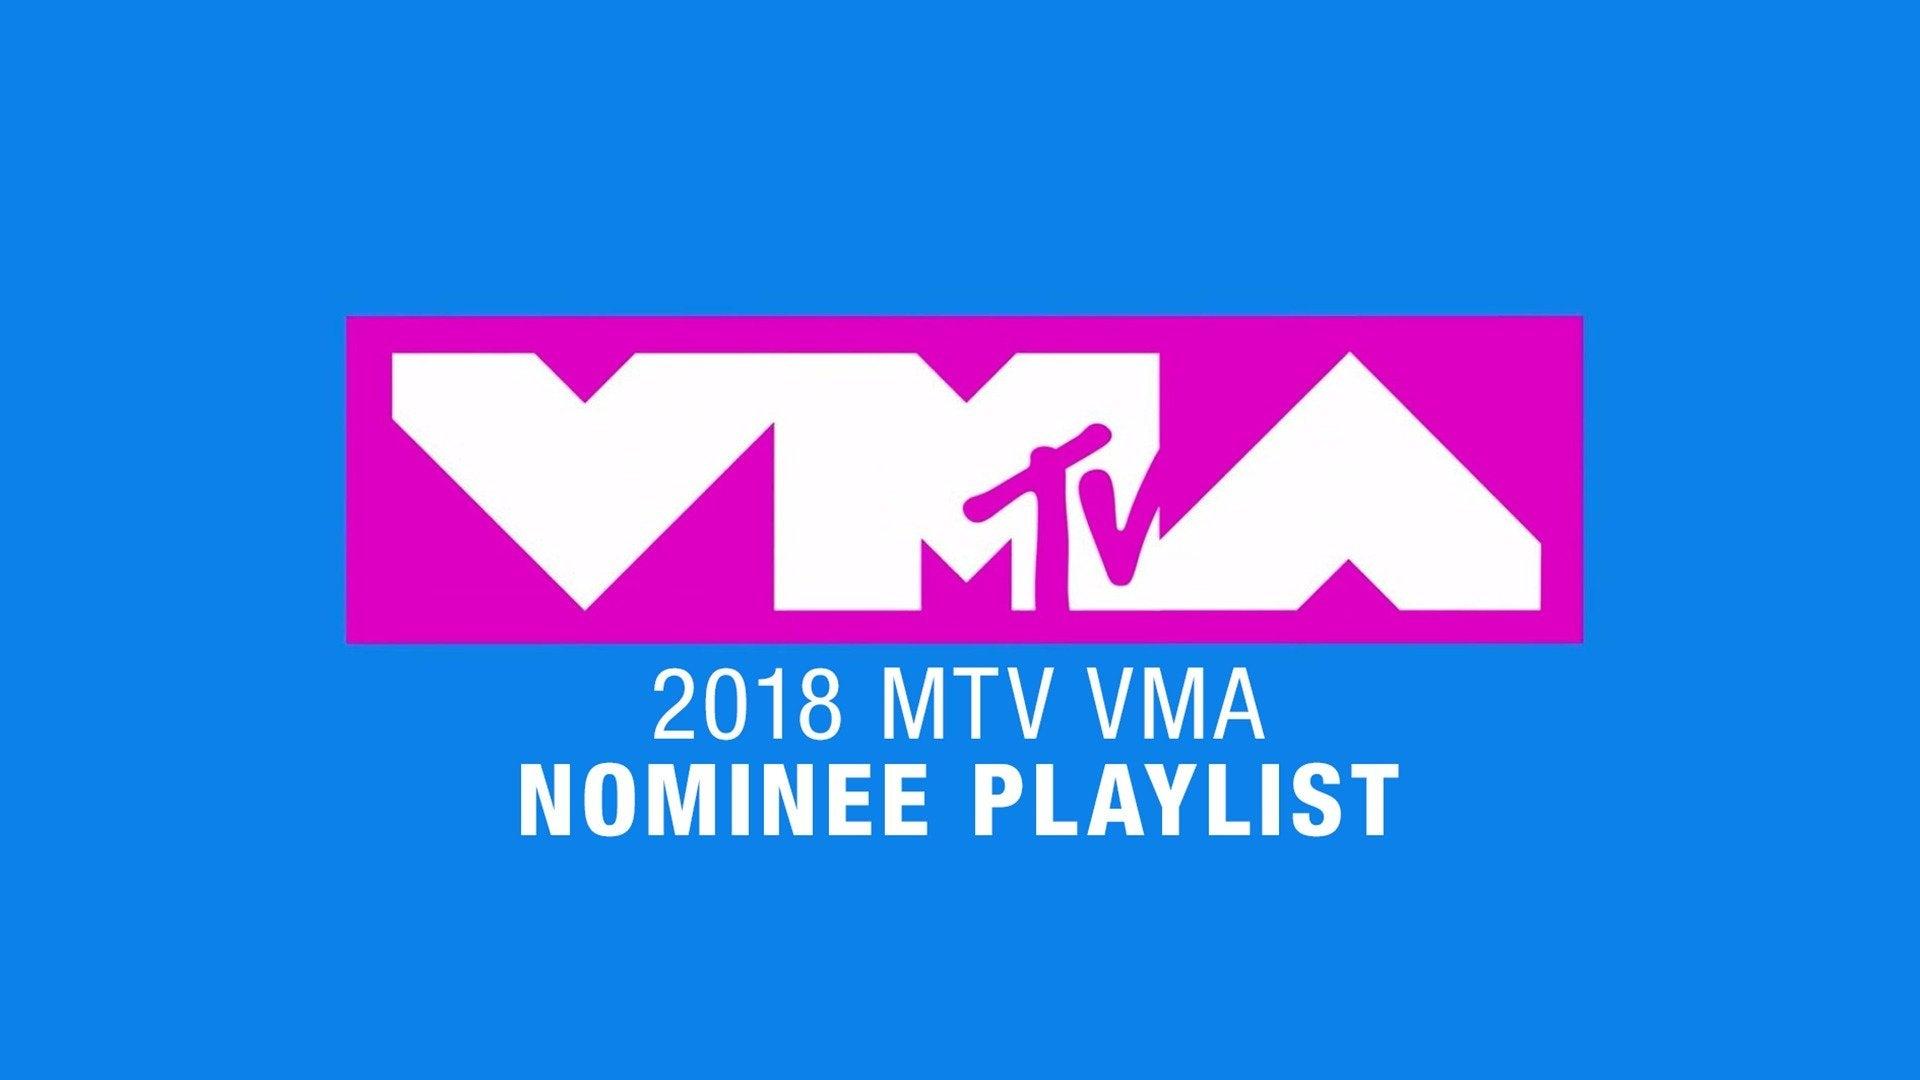 2018 MTV VMA Nominee Playlist